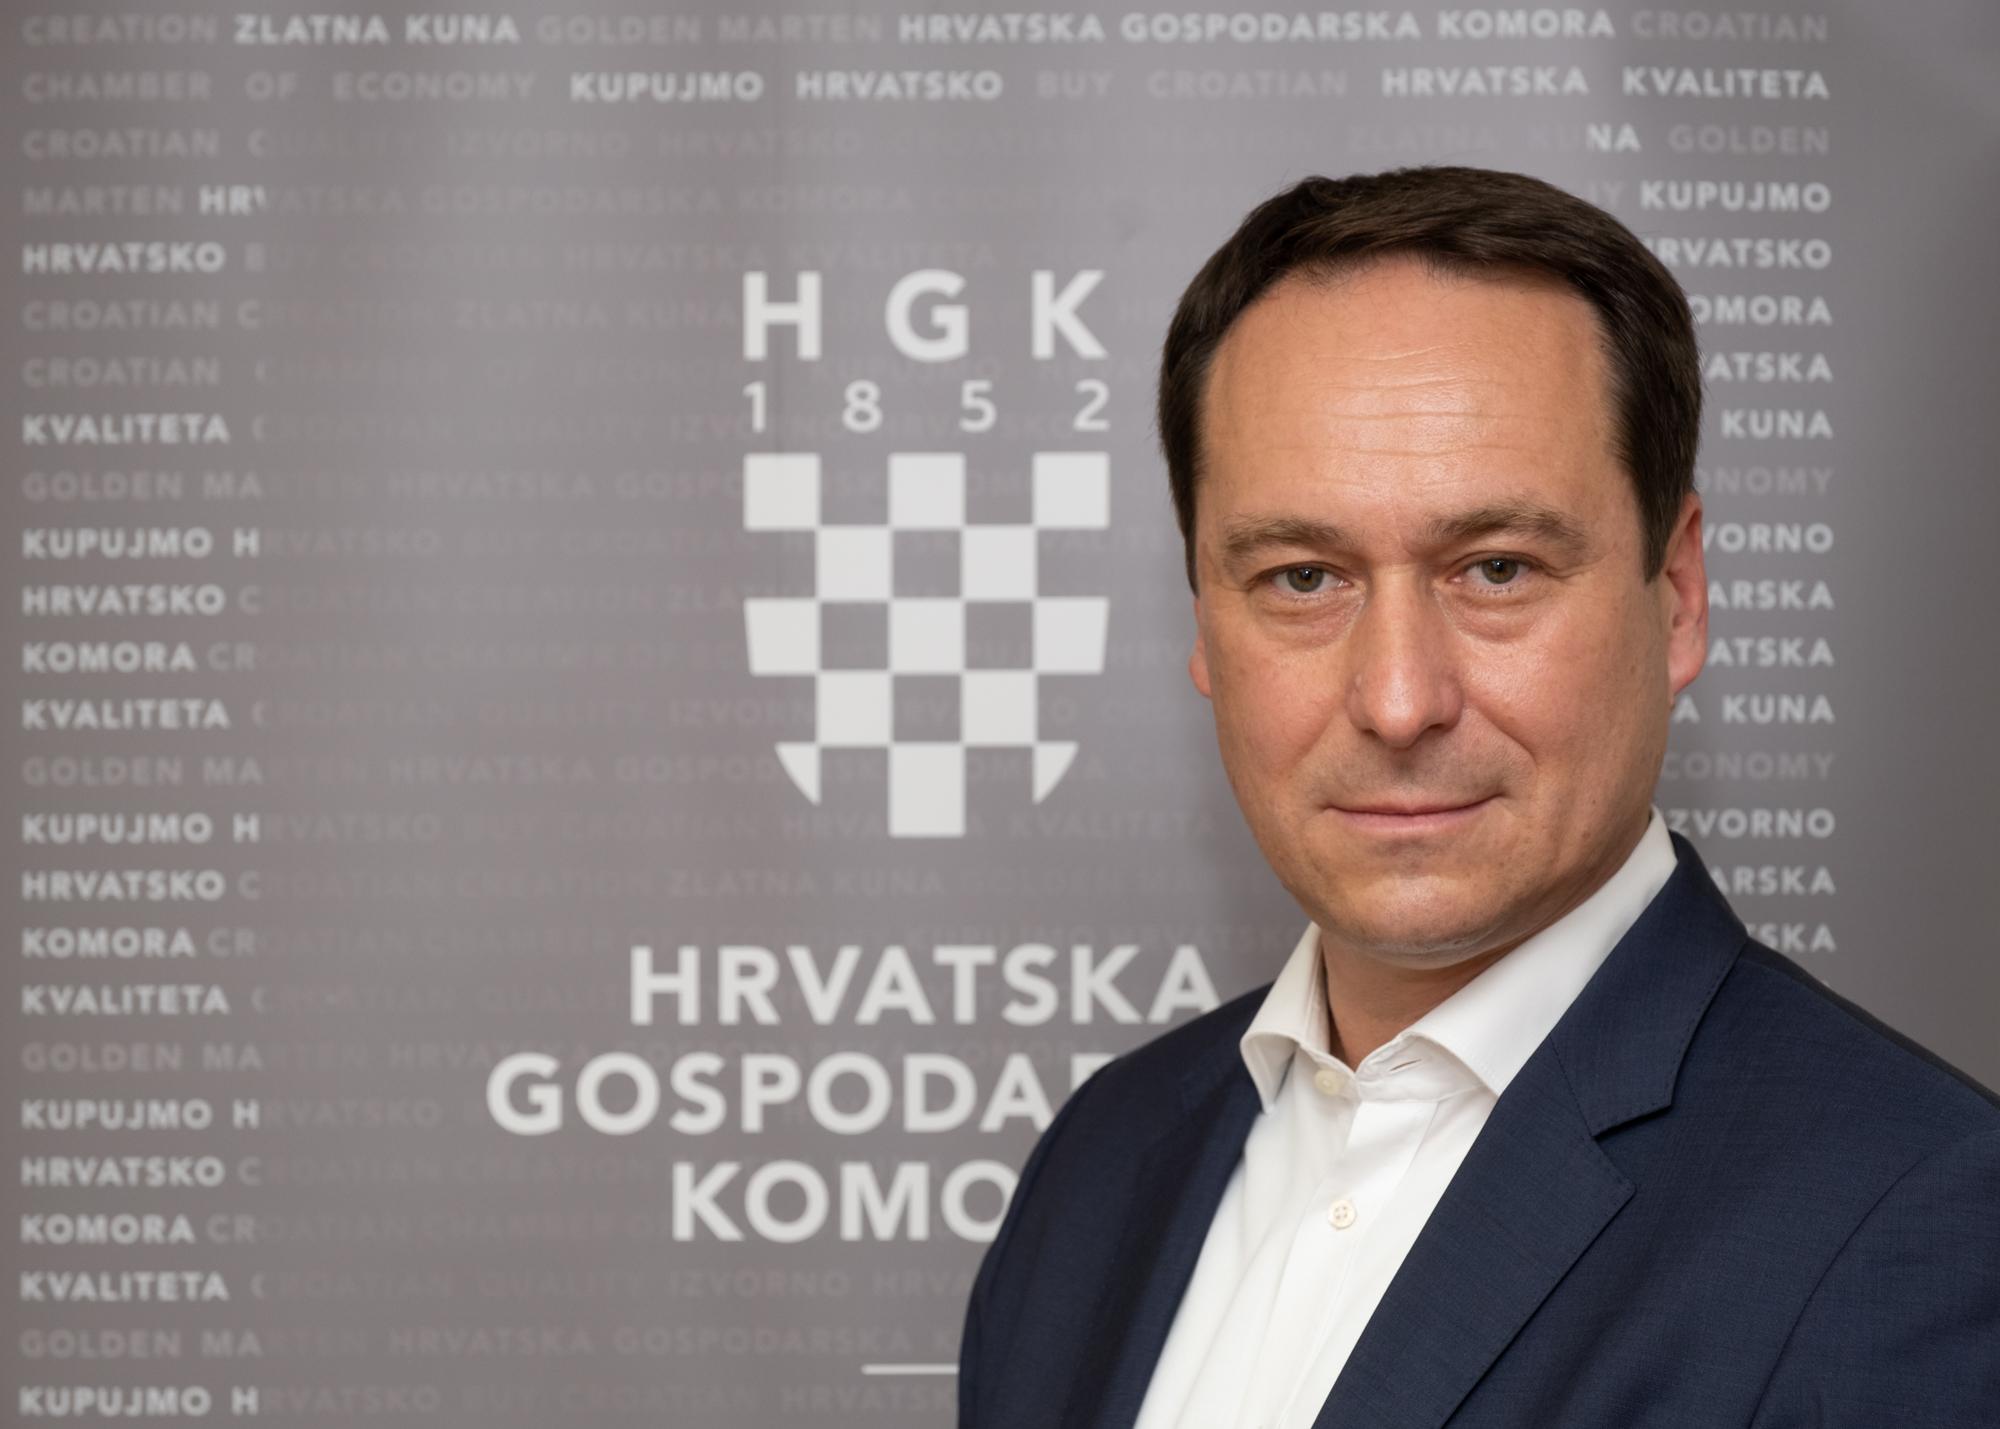 Tomislav Kulić